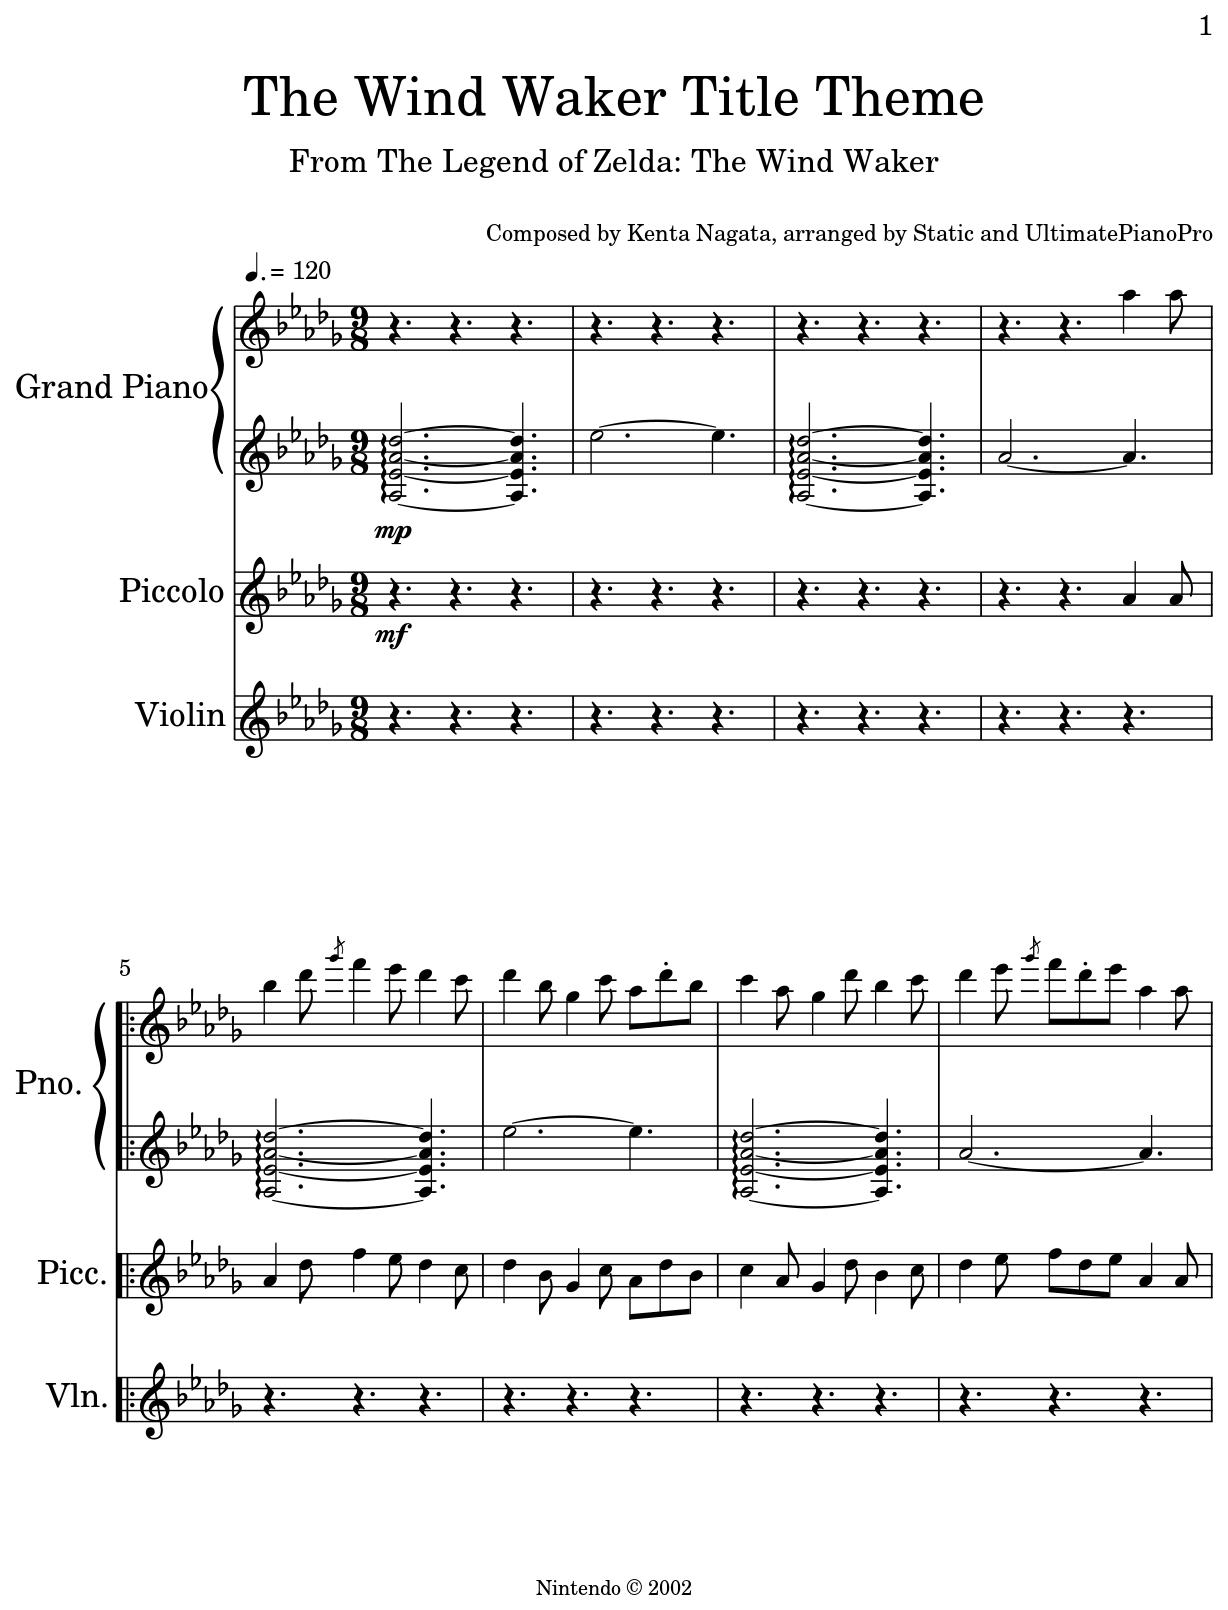 The Wind Waker Title Theme Flat